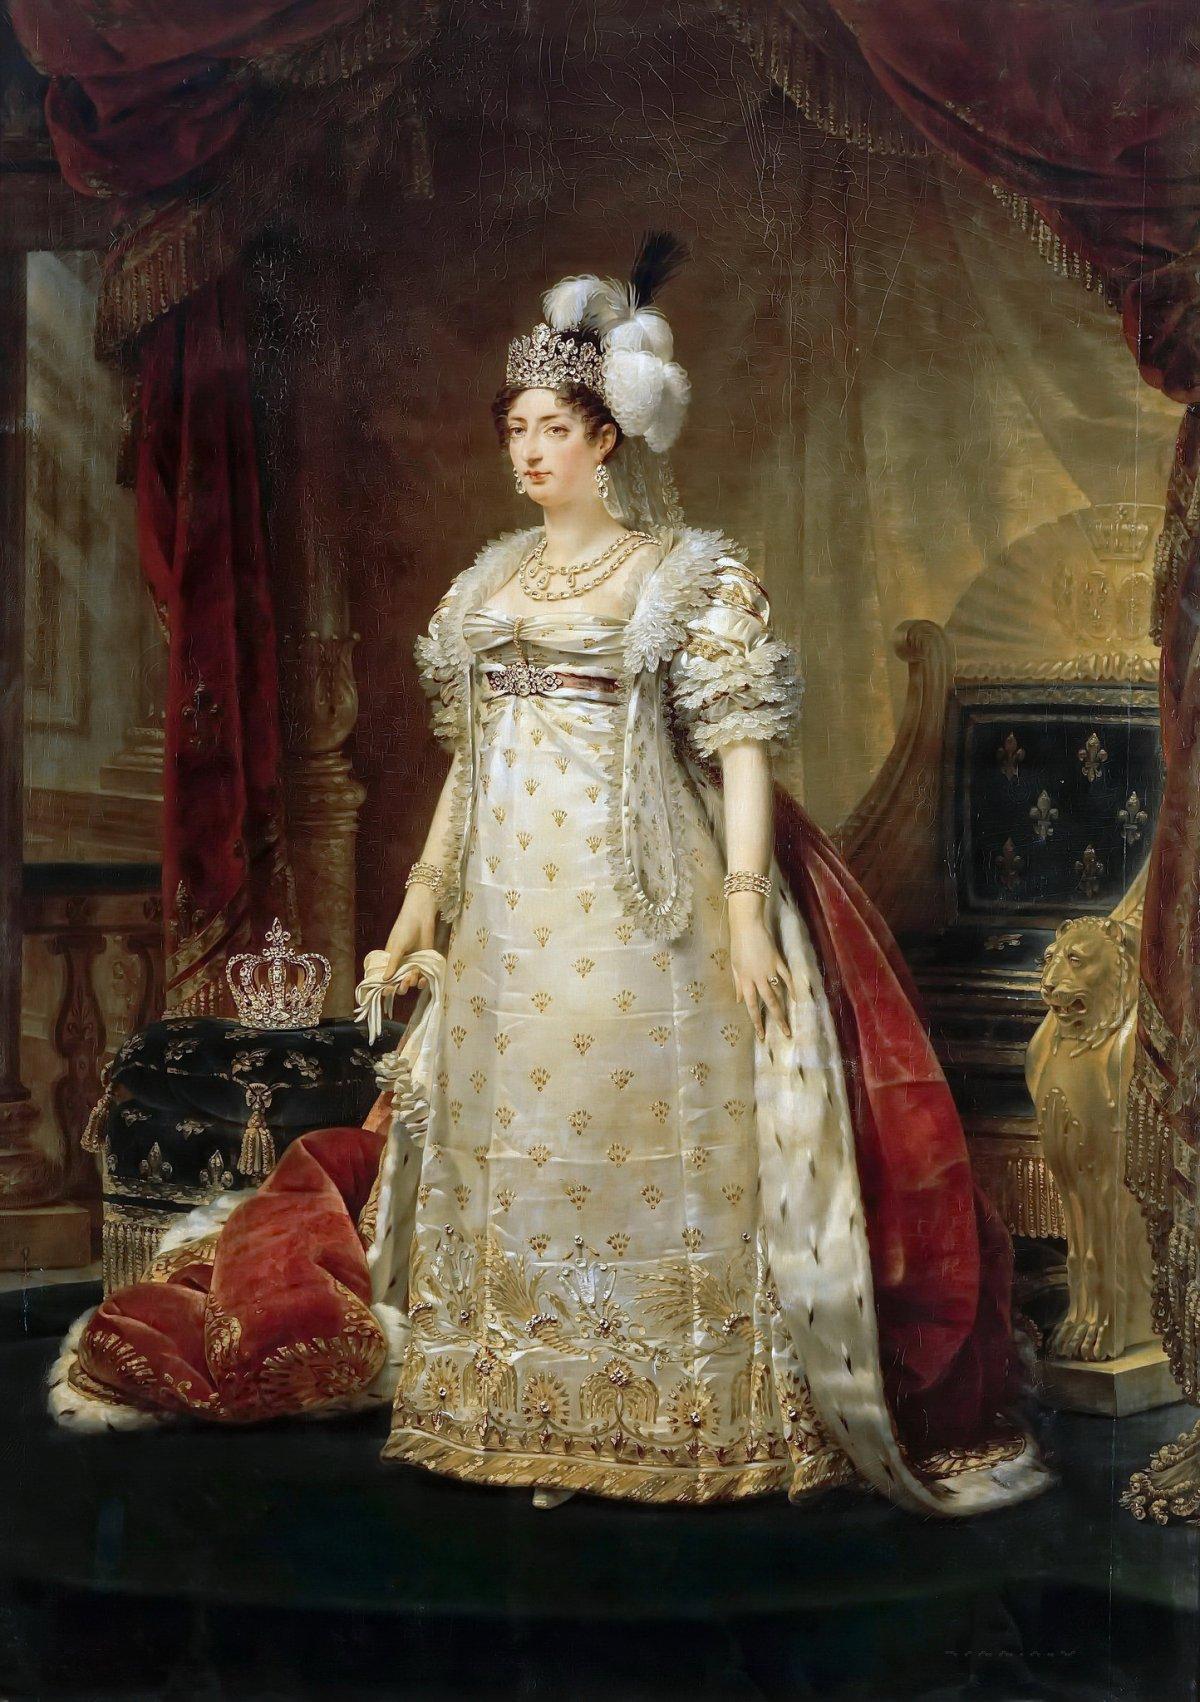 Portrait of Marie Thérèse Charlotte of France, Duchesse d'Angoulême by Antoine-Jean Gros, ca. 1816